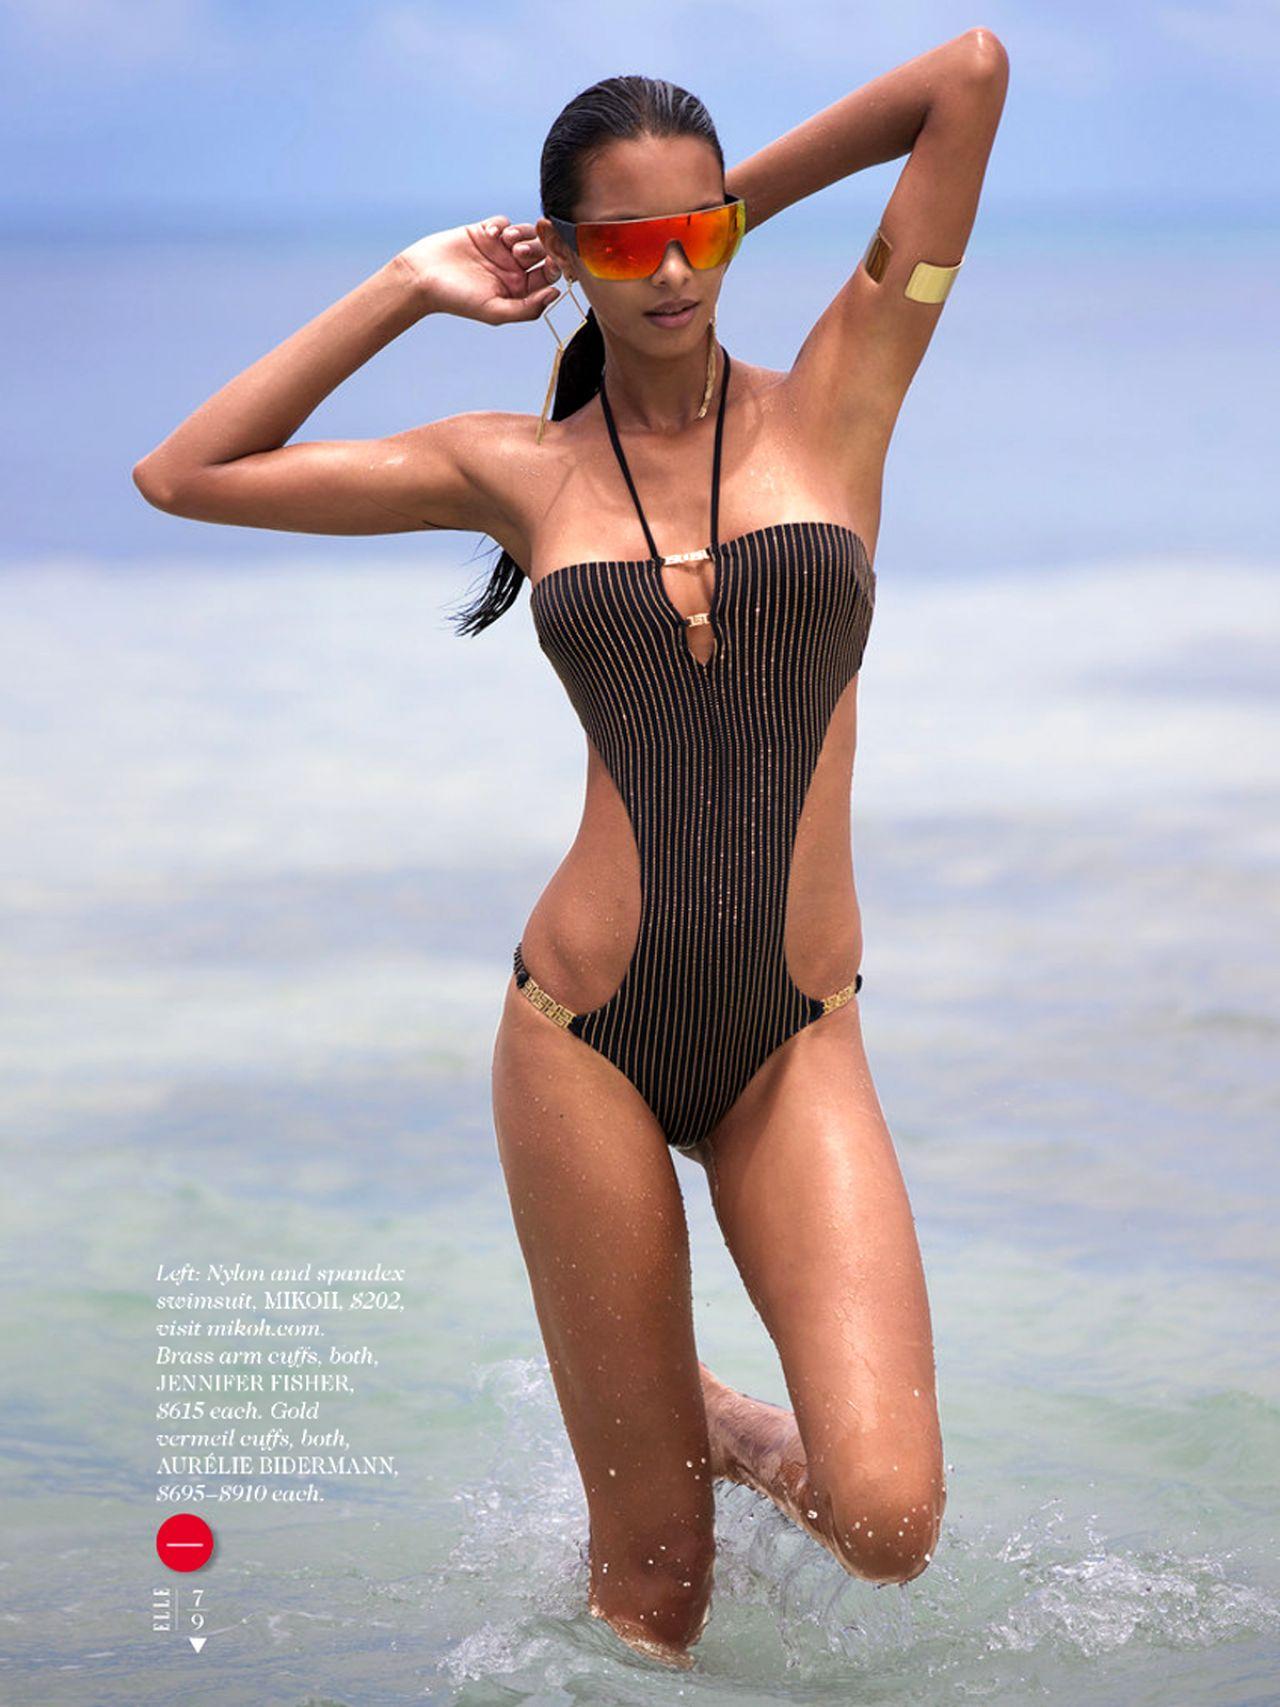 Lais Ribeiro - Elle Magazine June 2014 Issue